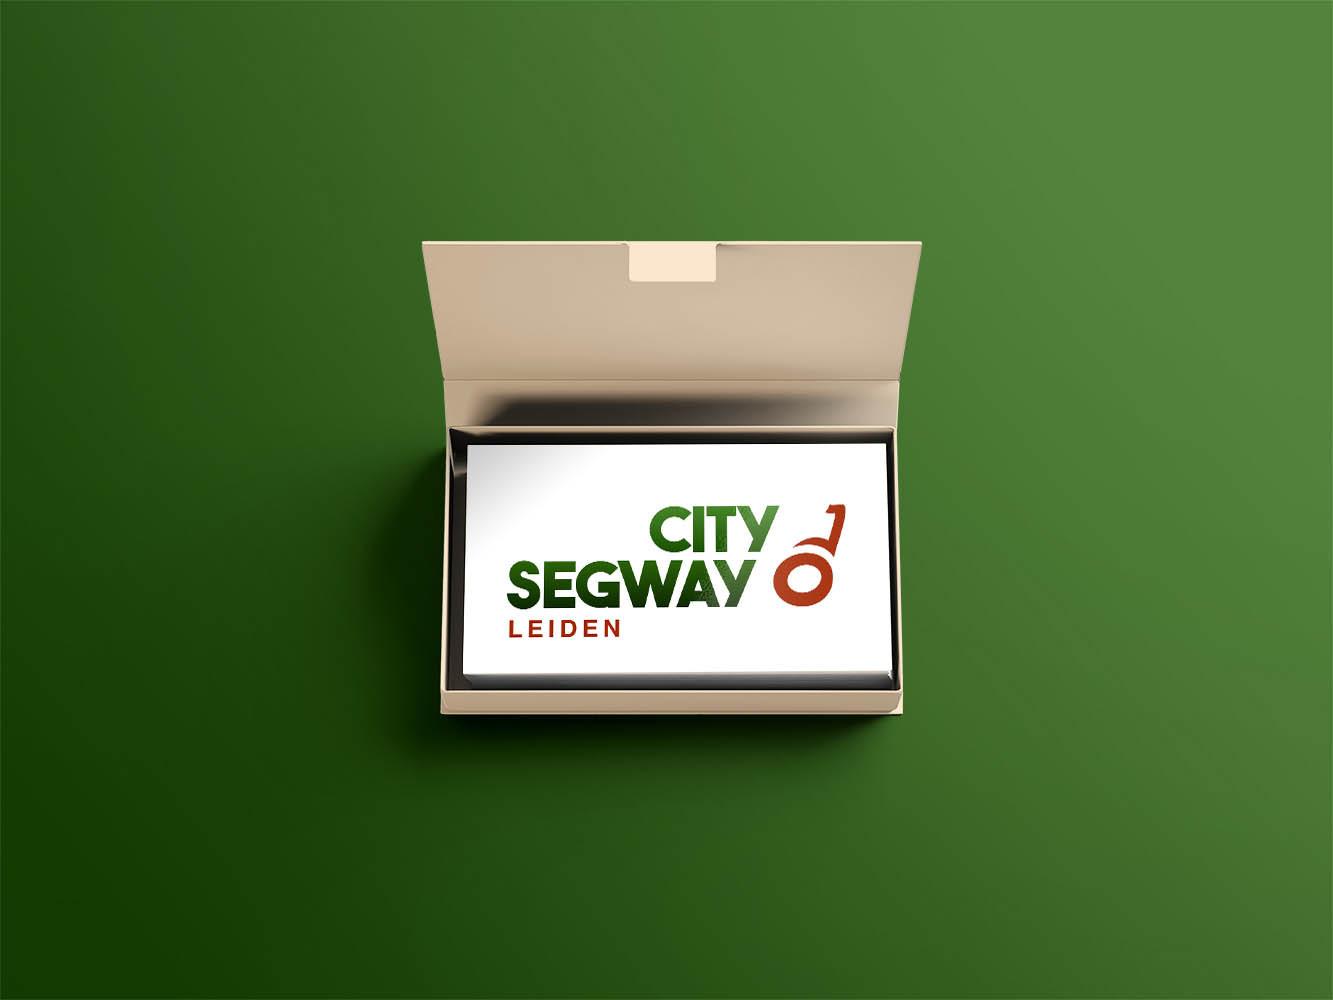 CitySegway_logo02.jpg